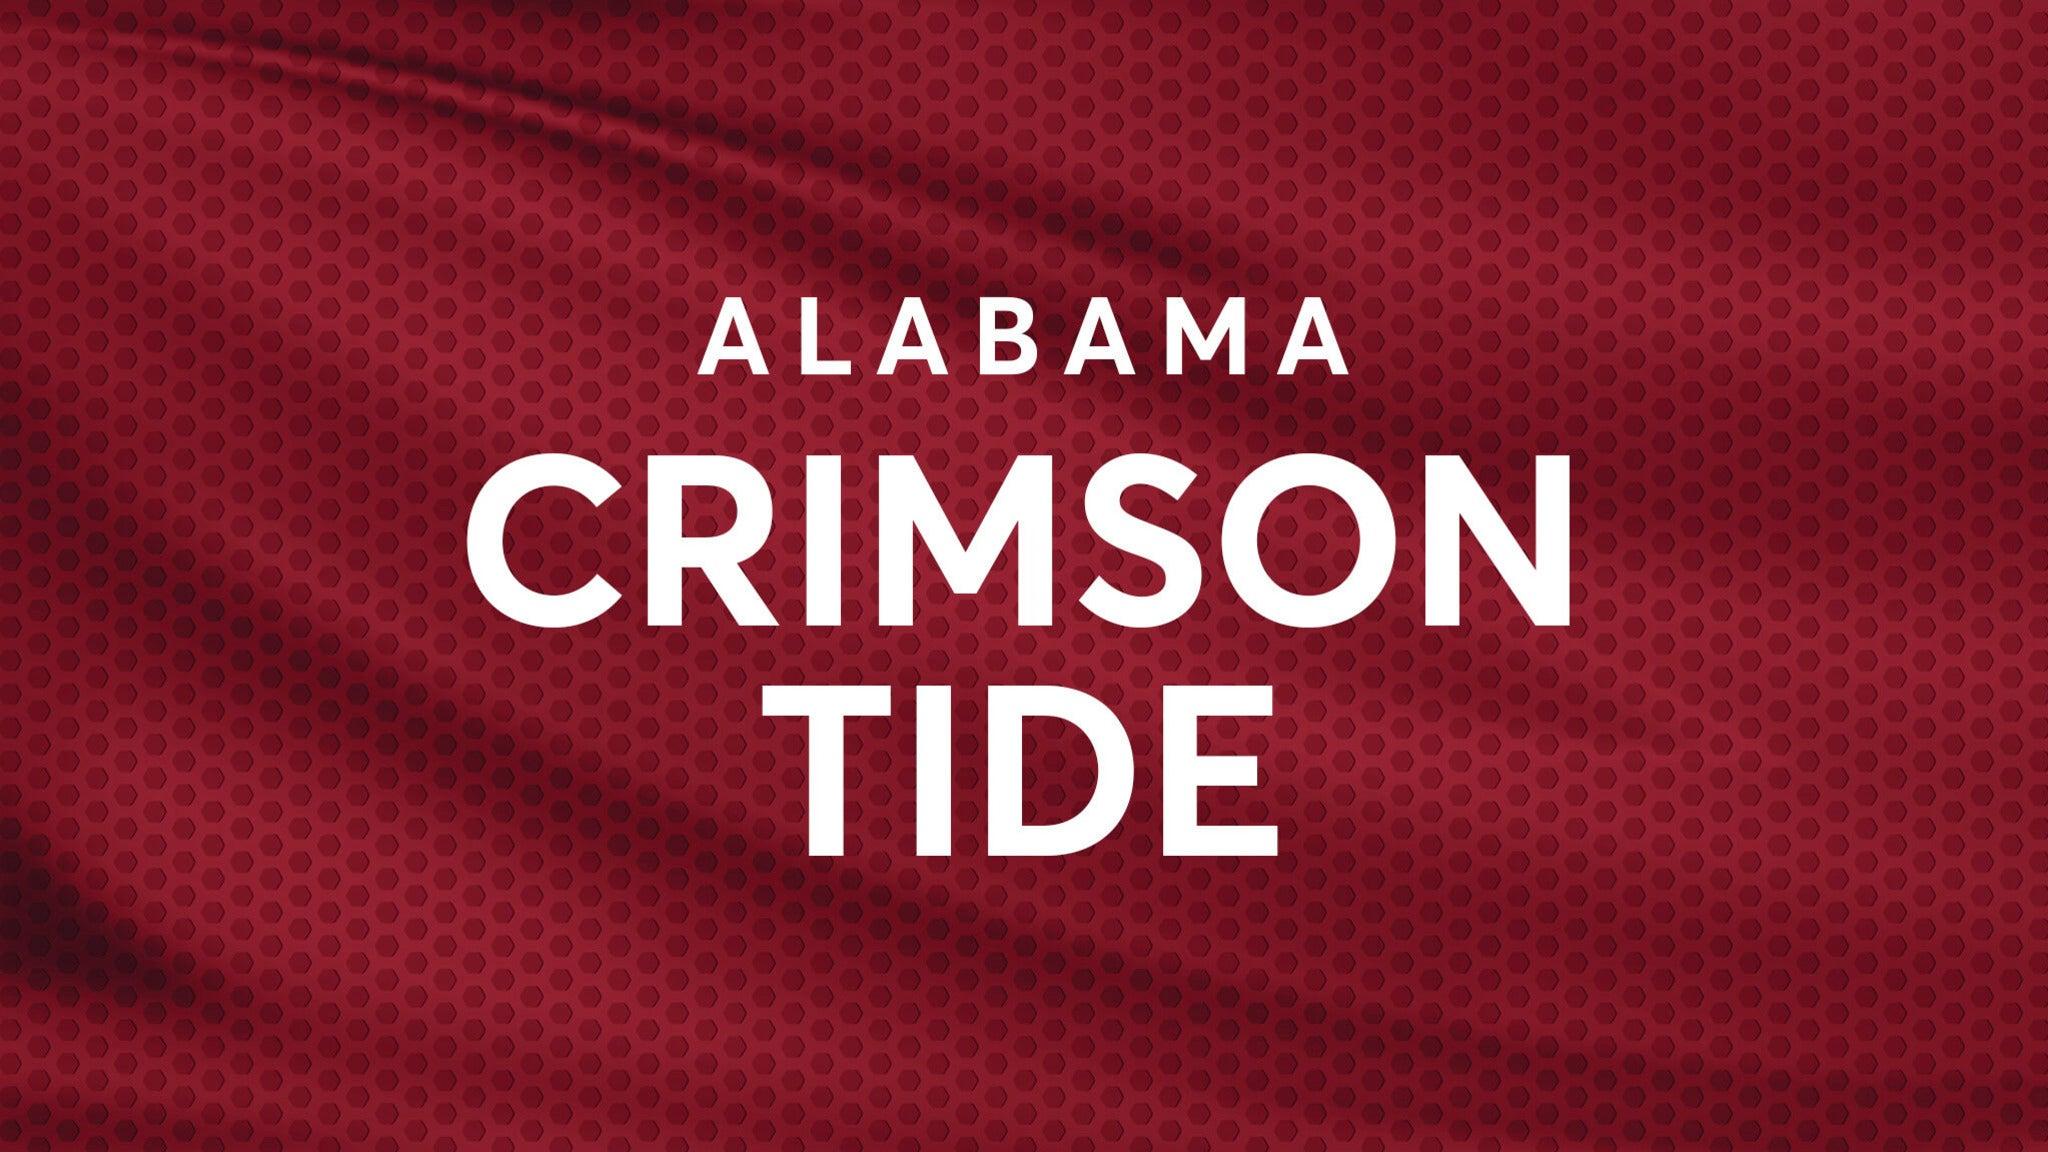 Alabama Crimson Tide Football vs. LSU Tigers Football